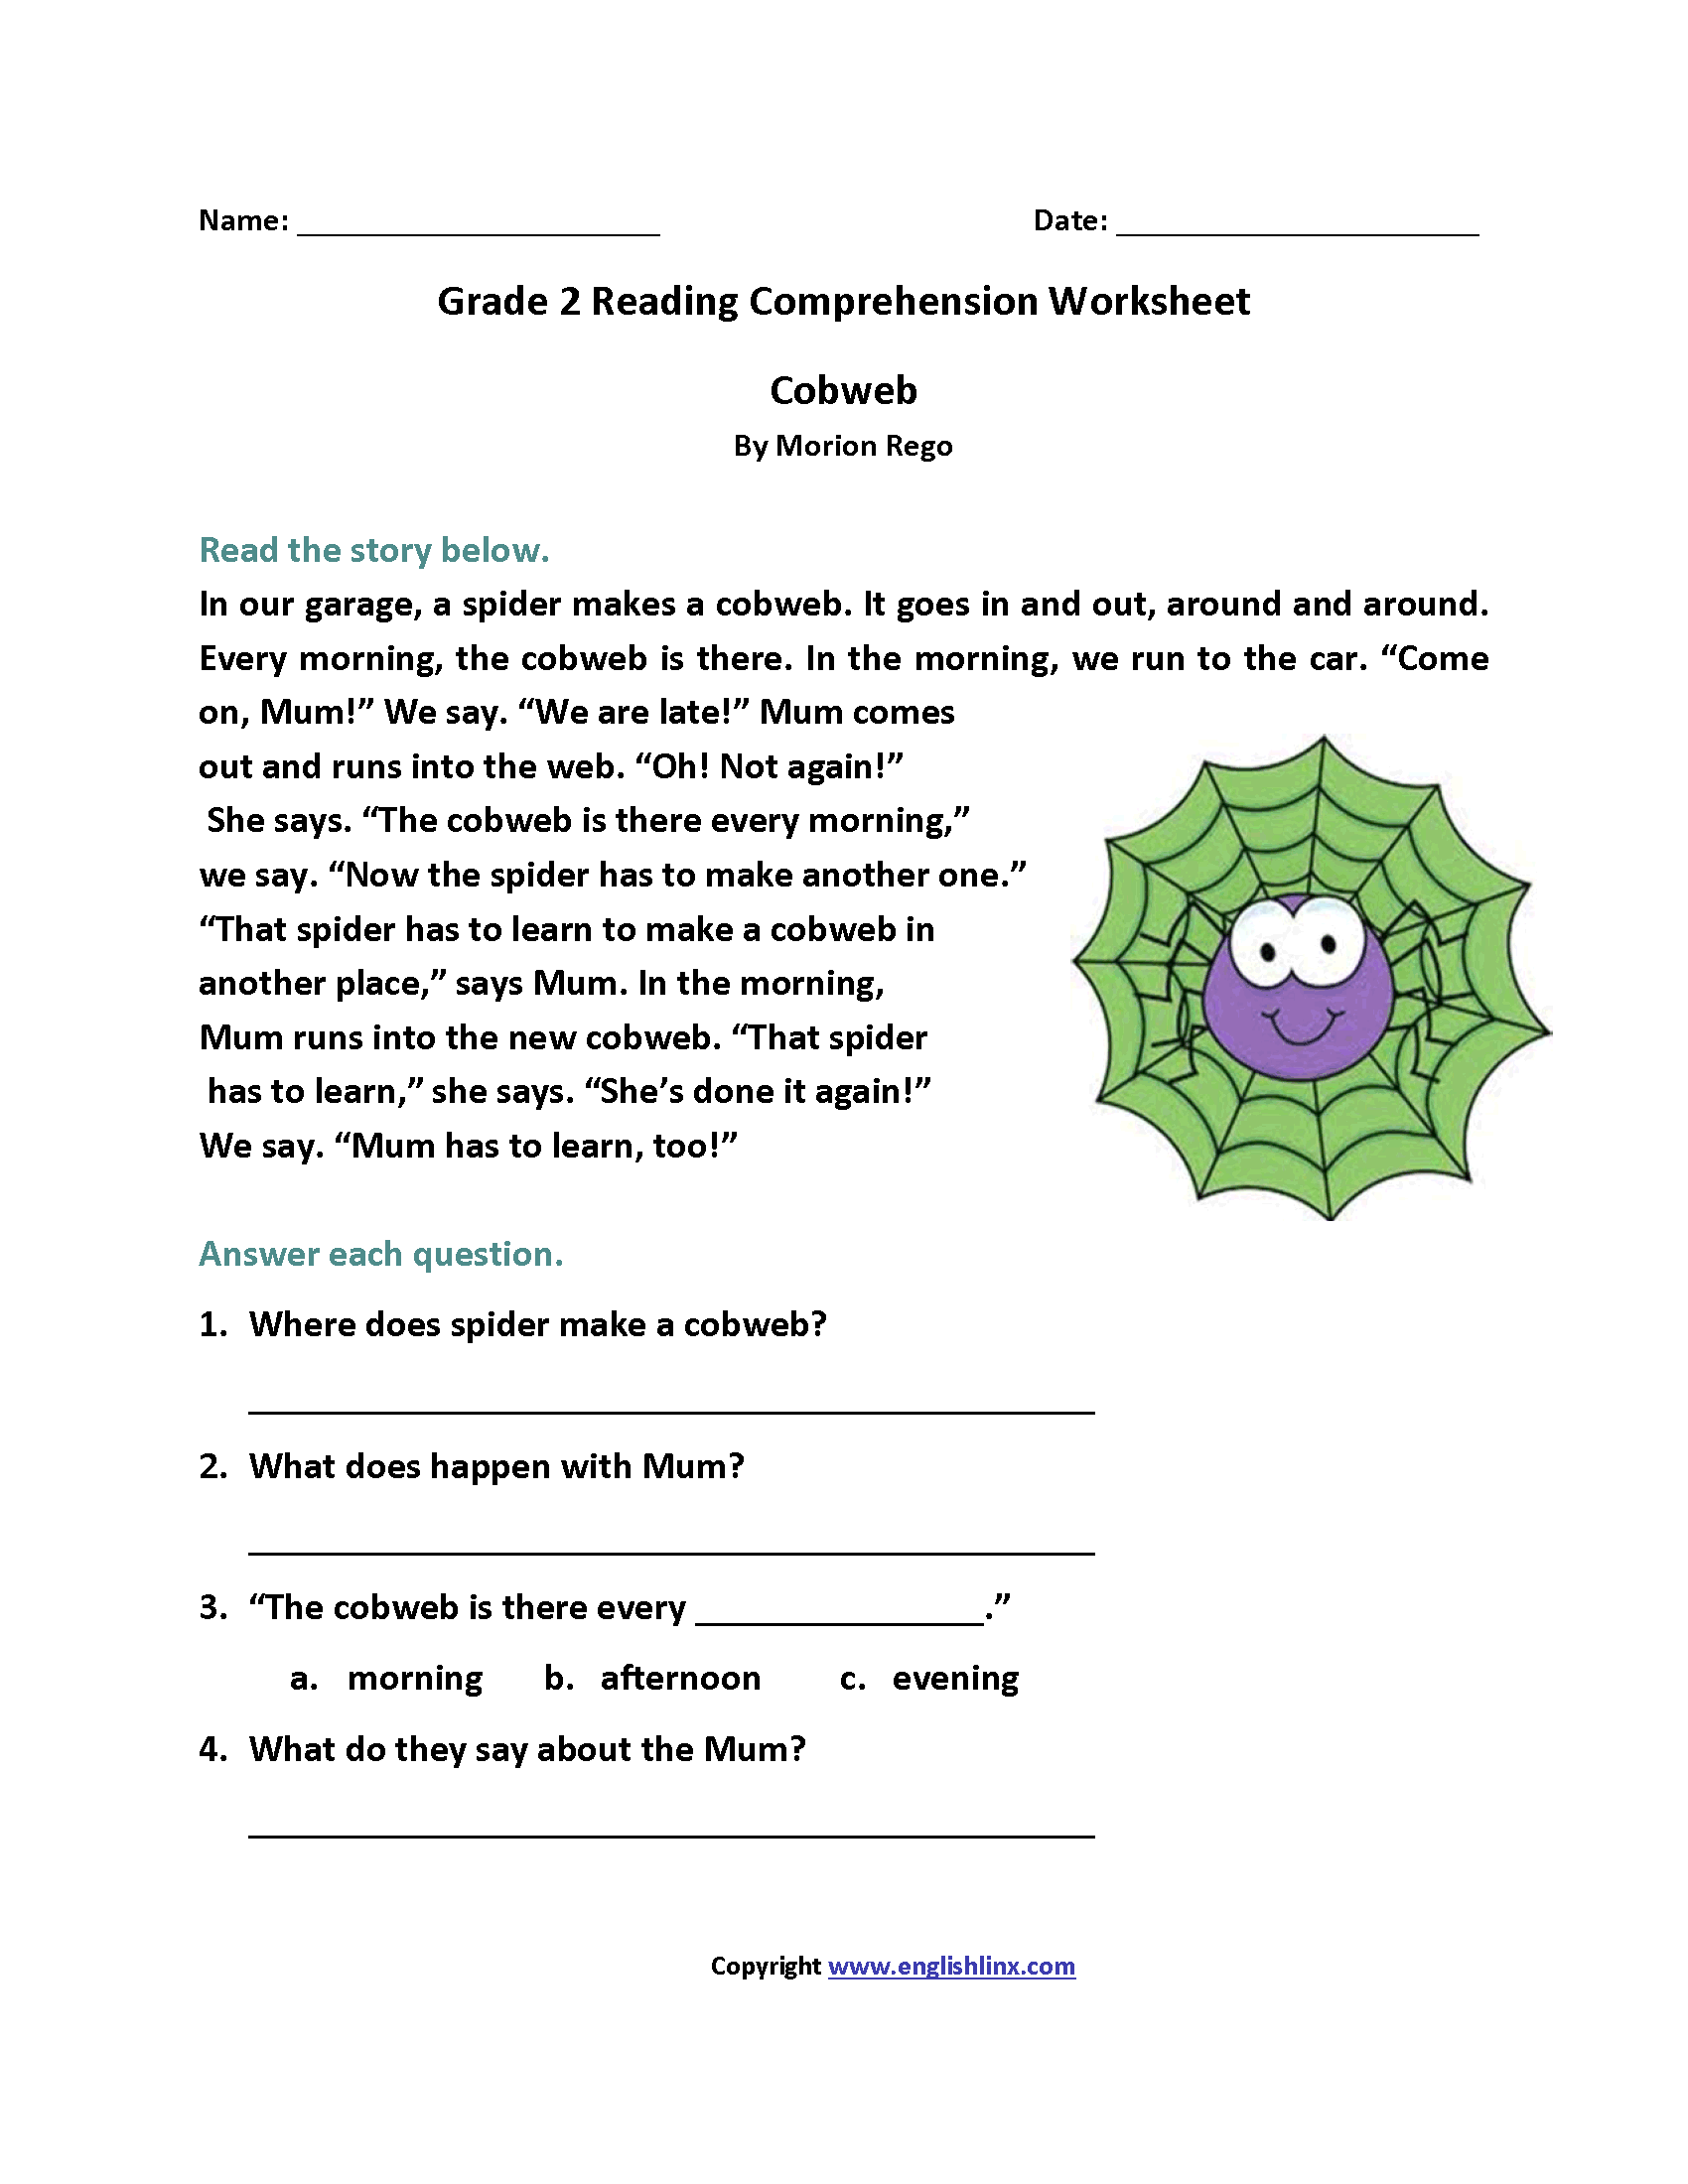 Reading Worksheets For 2nd Grade The Best Worksheets Image